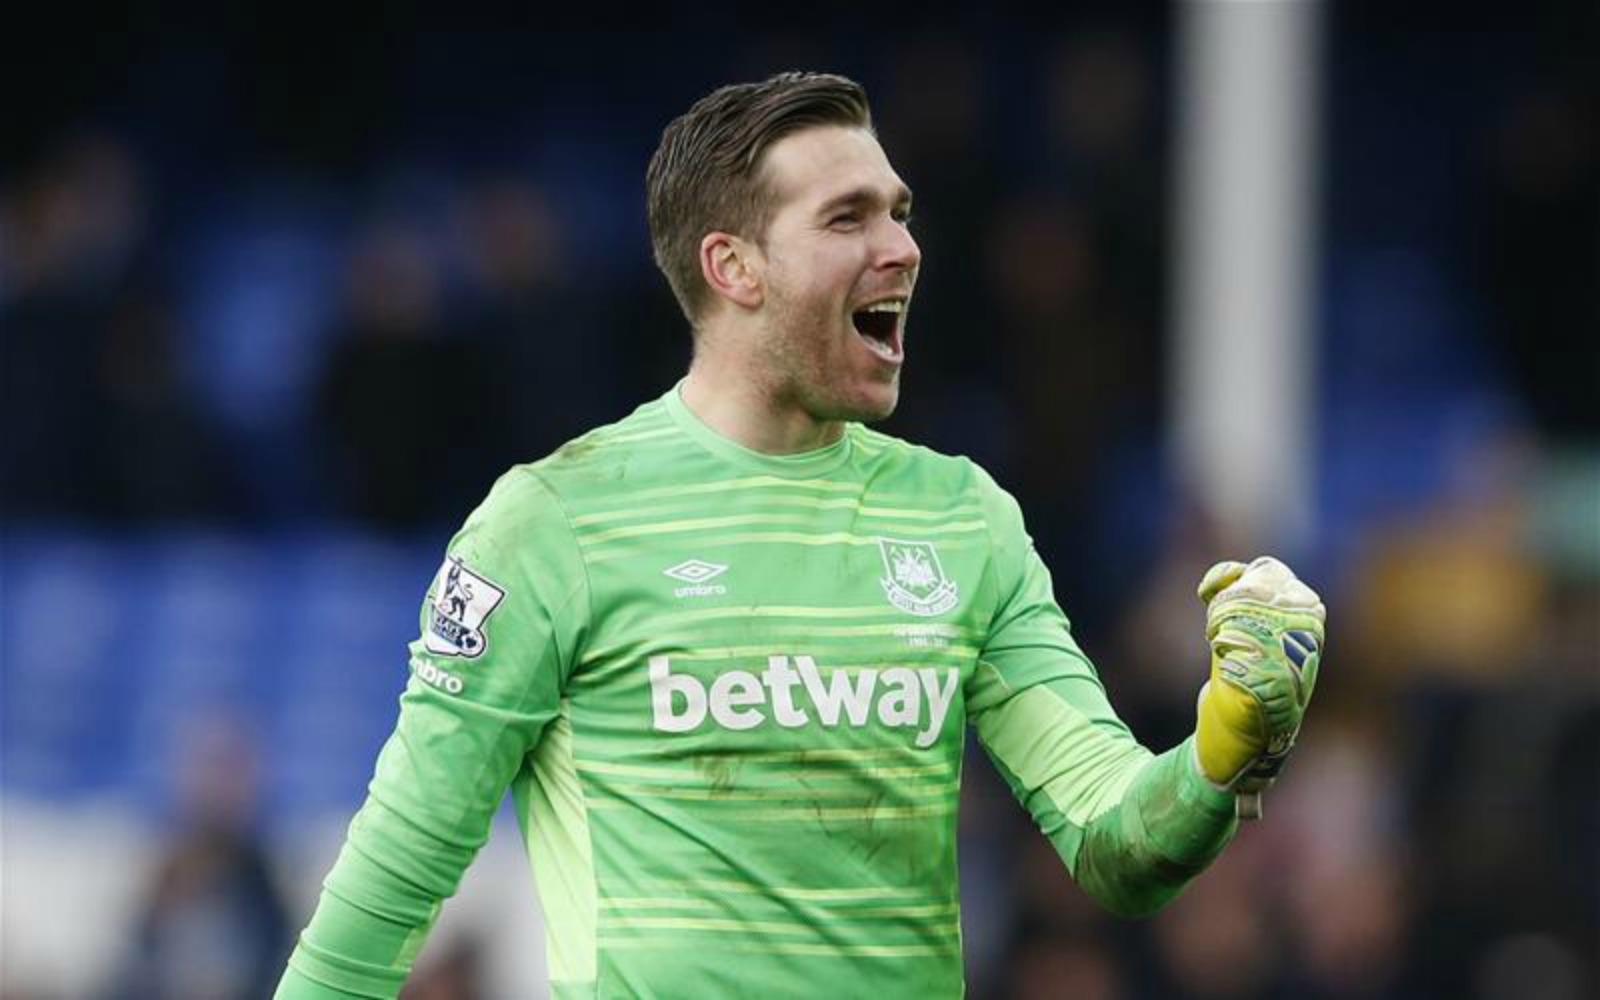 West Ham goalkeeper scores dazzling solo goal in testimonial match